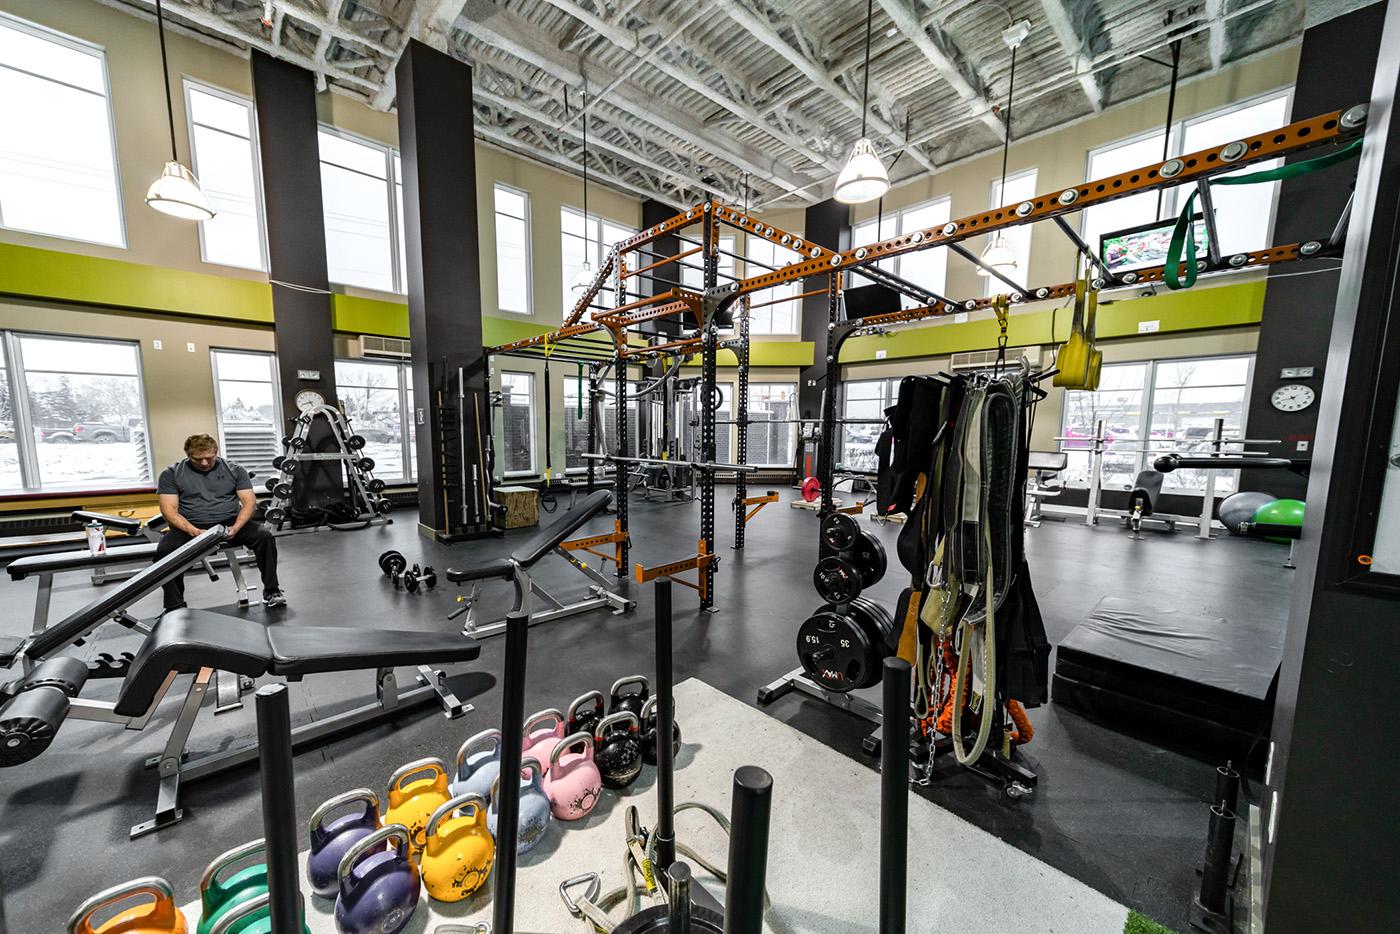 cityfit-gym-personal-training-calgary-workout-facility-inglewood-2.jpg